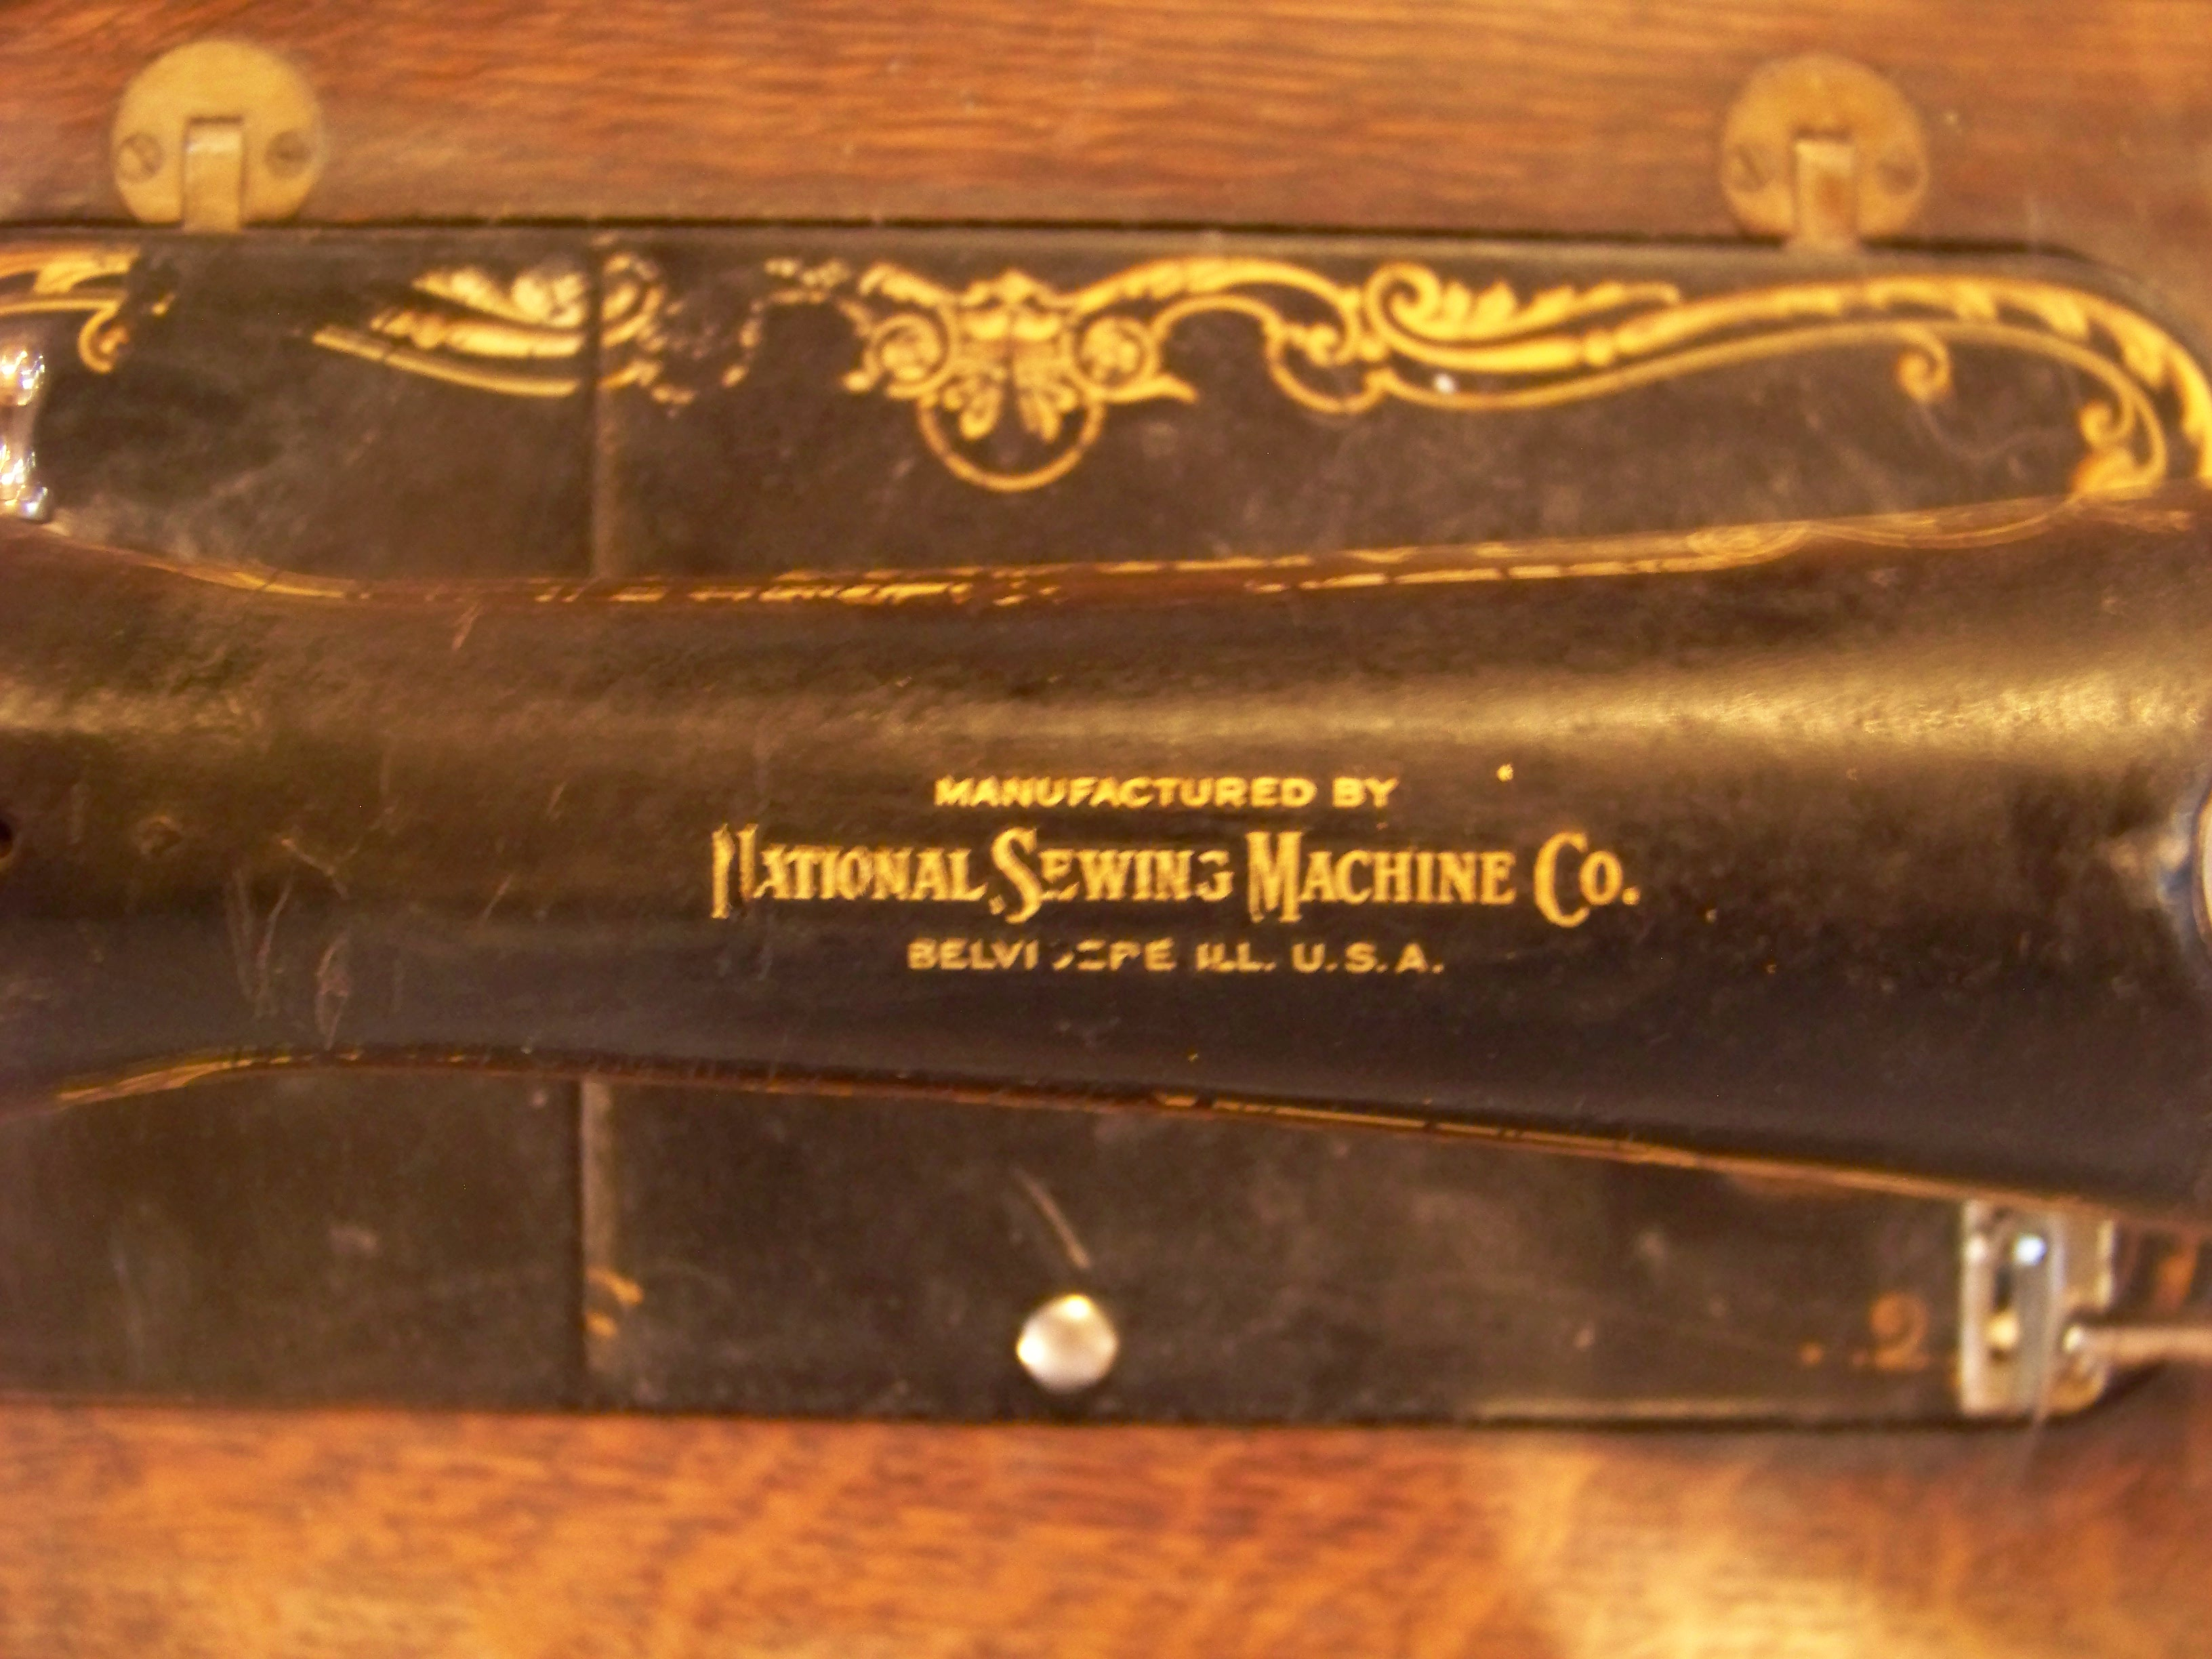 Name:  National Sewing Machine 027.JPG Views: 563 Size:  907.1 KB